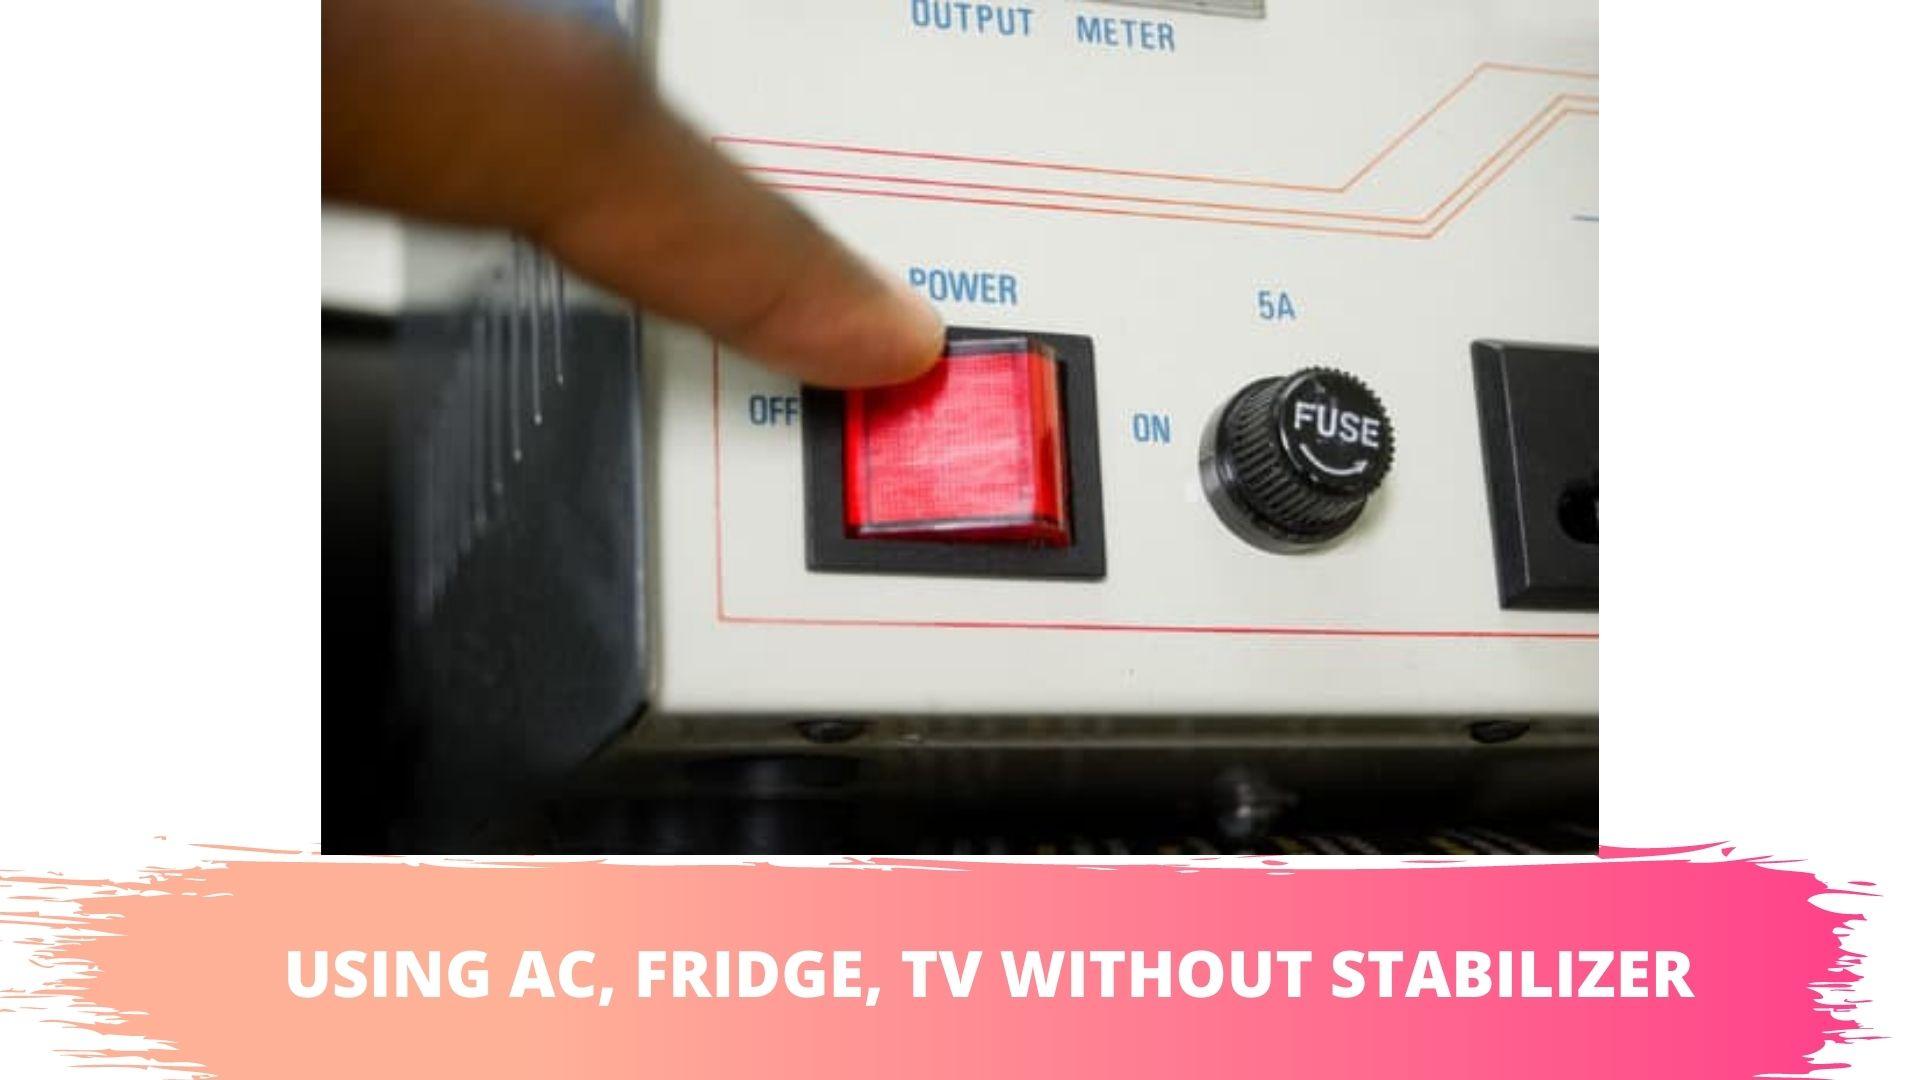 ac,tv,fridge,treadmill without stabilizer